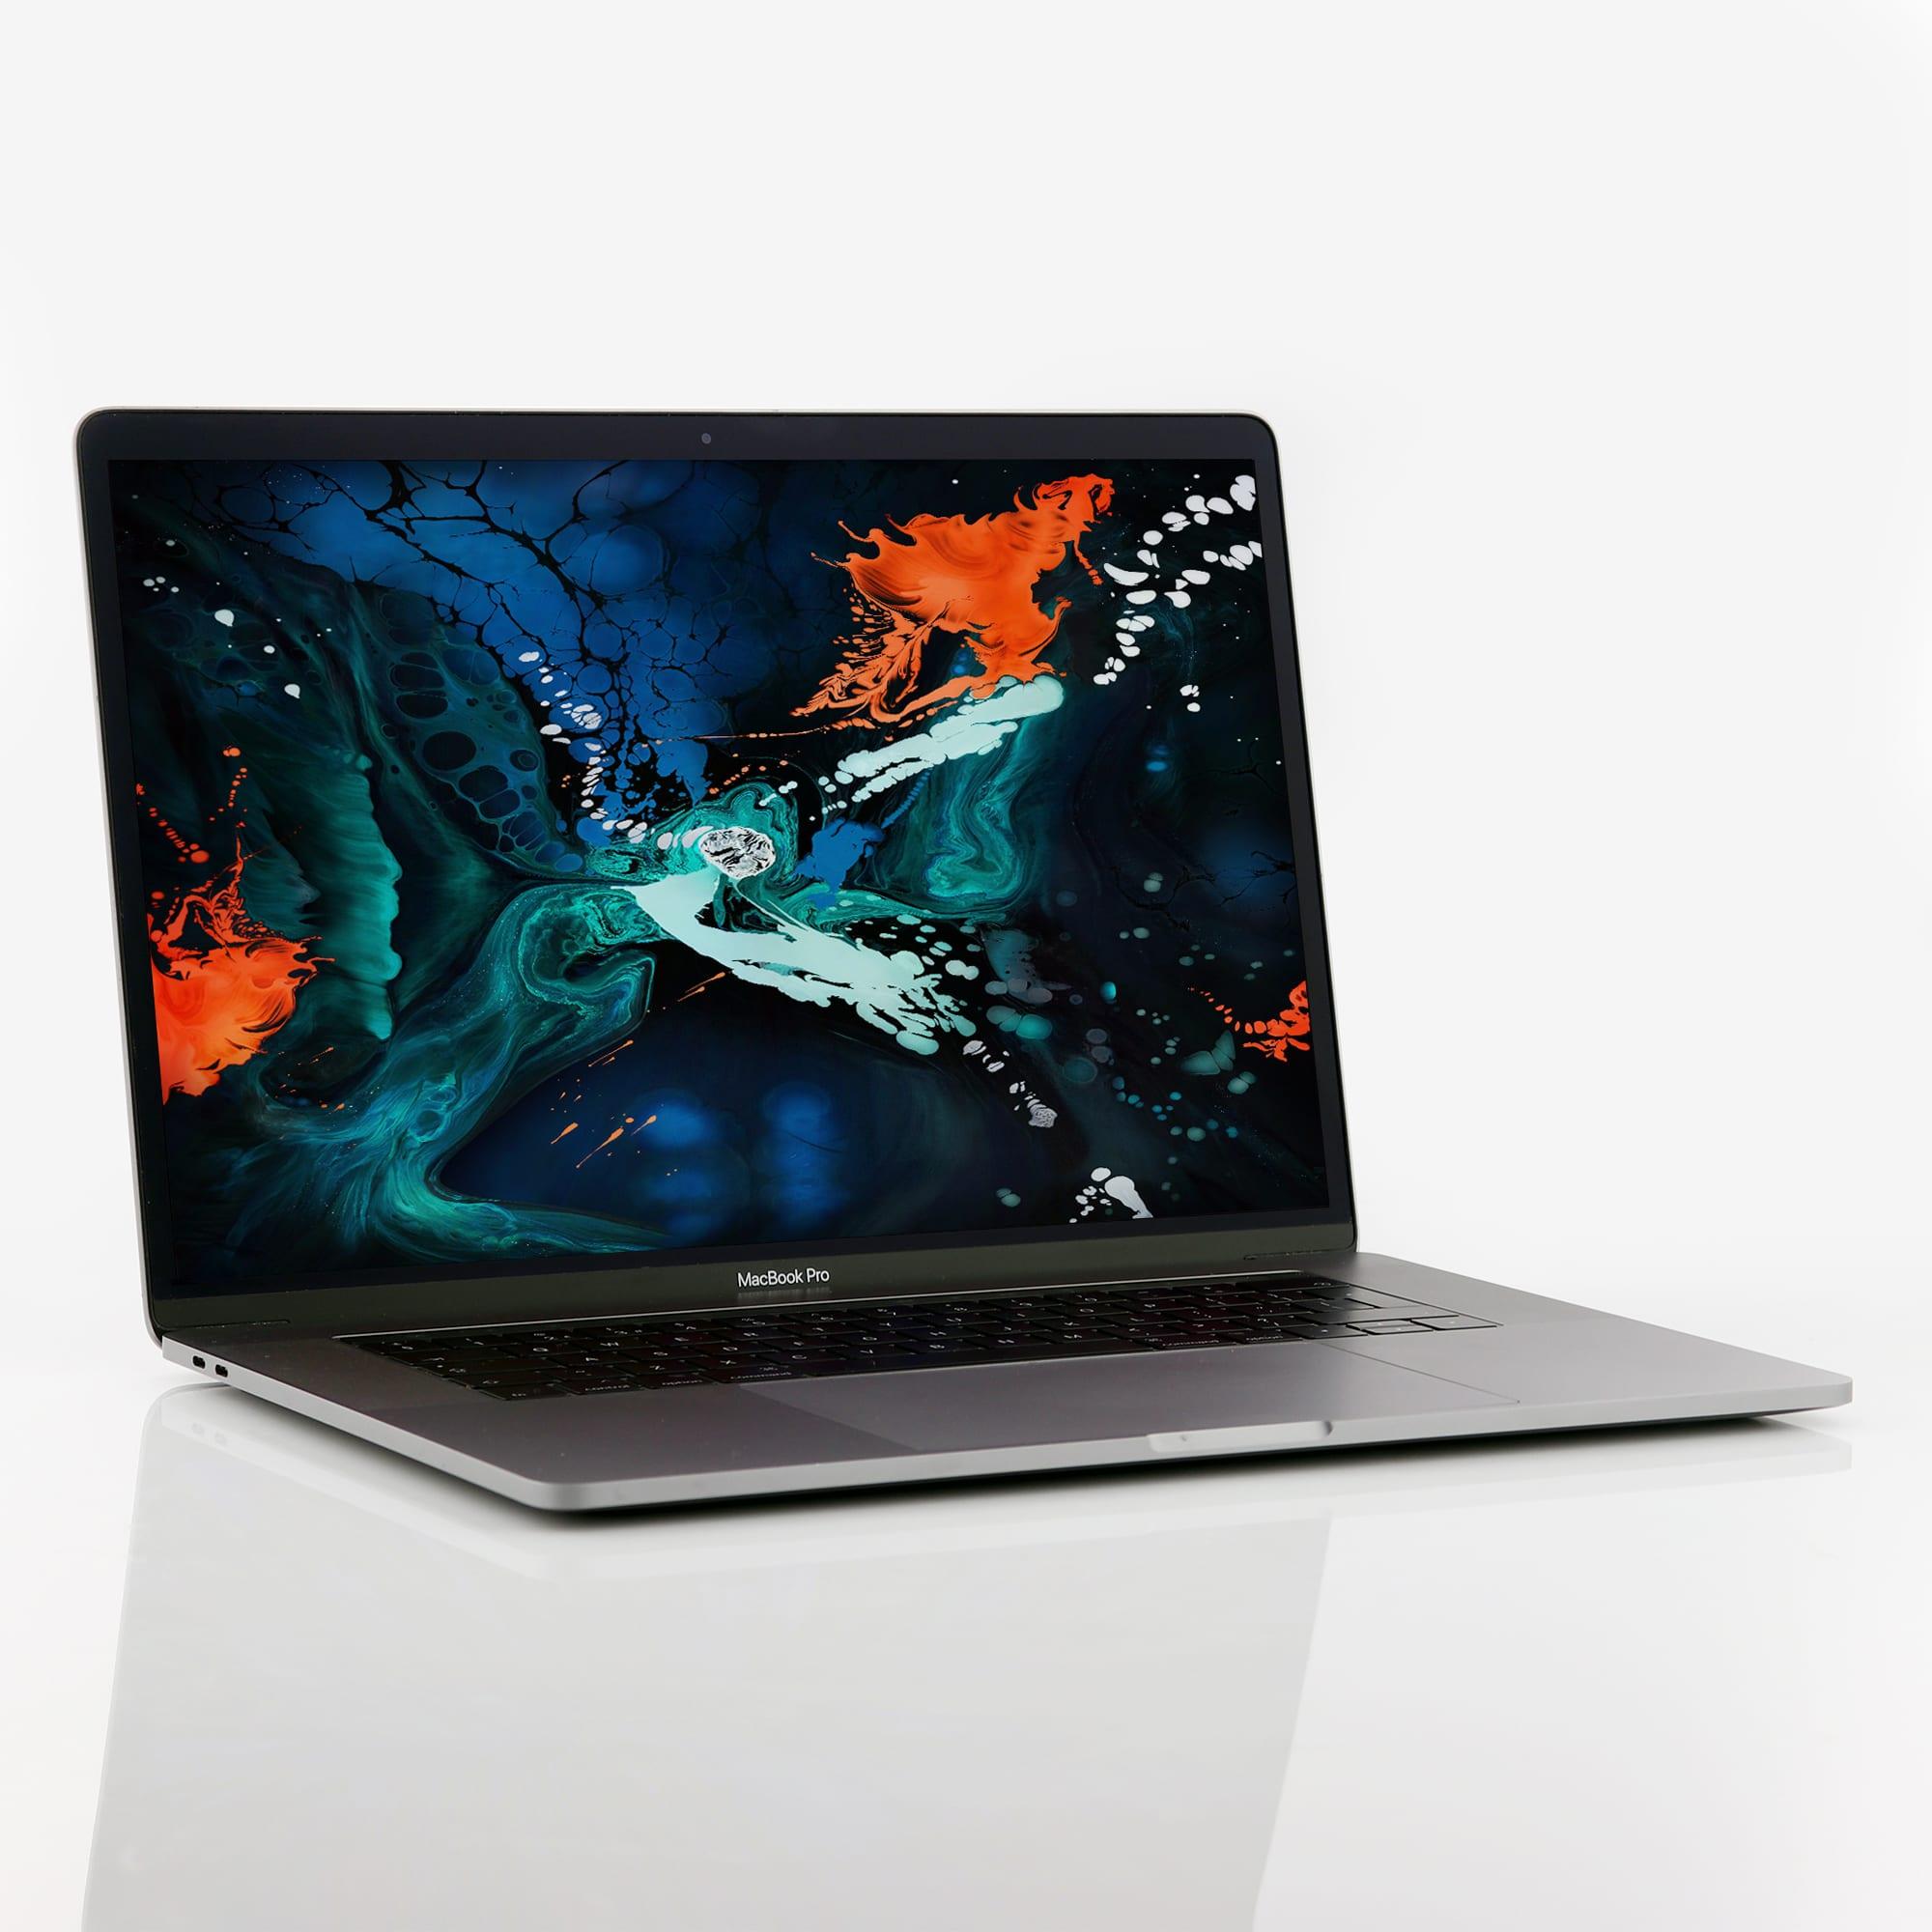 1 x Apple MacBook Pro Retina 15 Inch Touchbar Intel Core i7 2.20 GHz (2018)